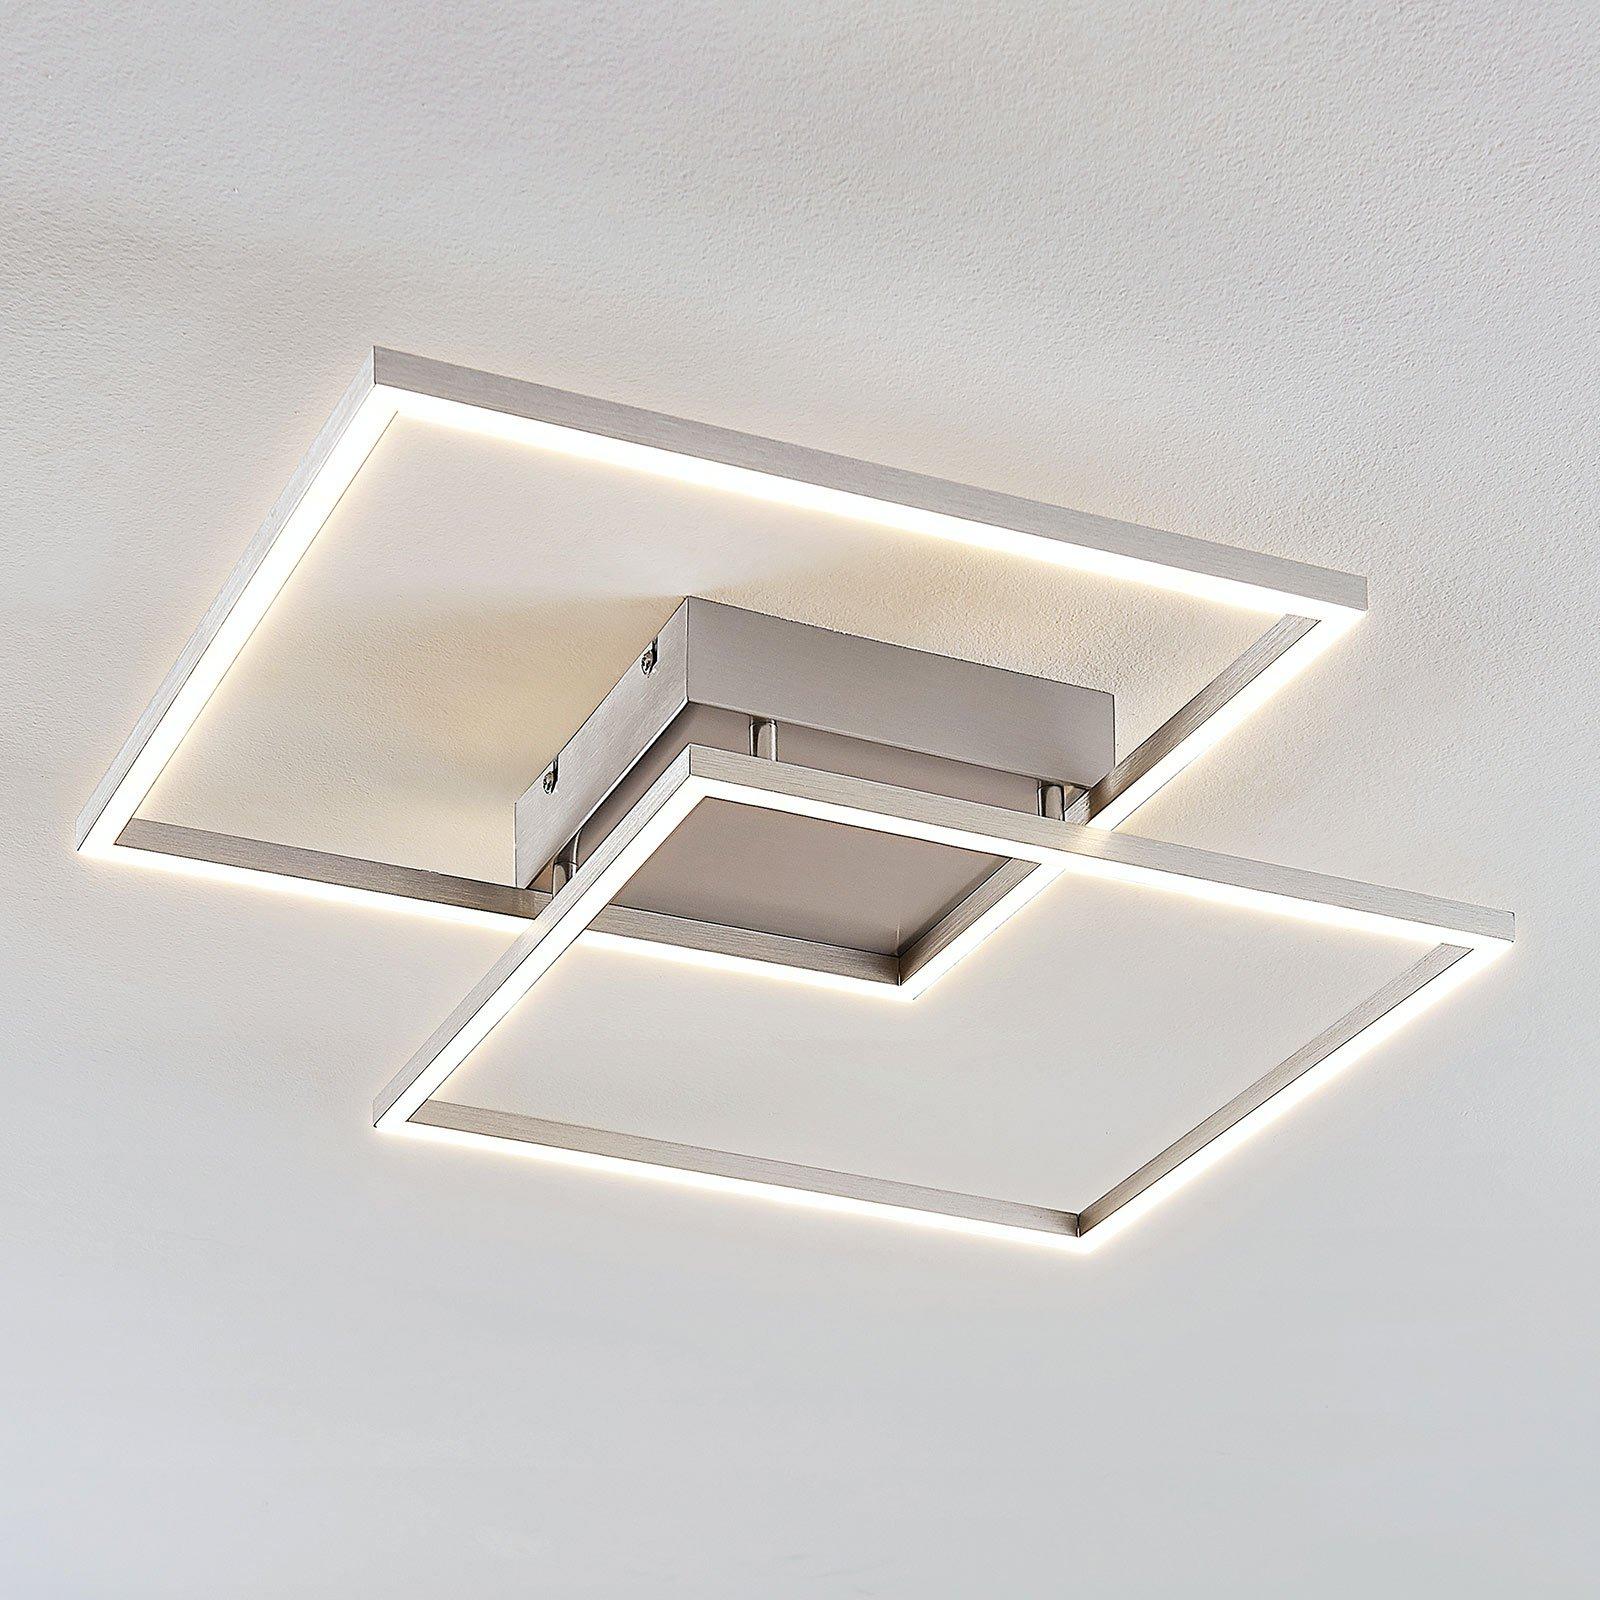 Interessant formet LED-taklampe Mirac